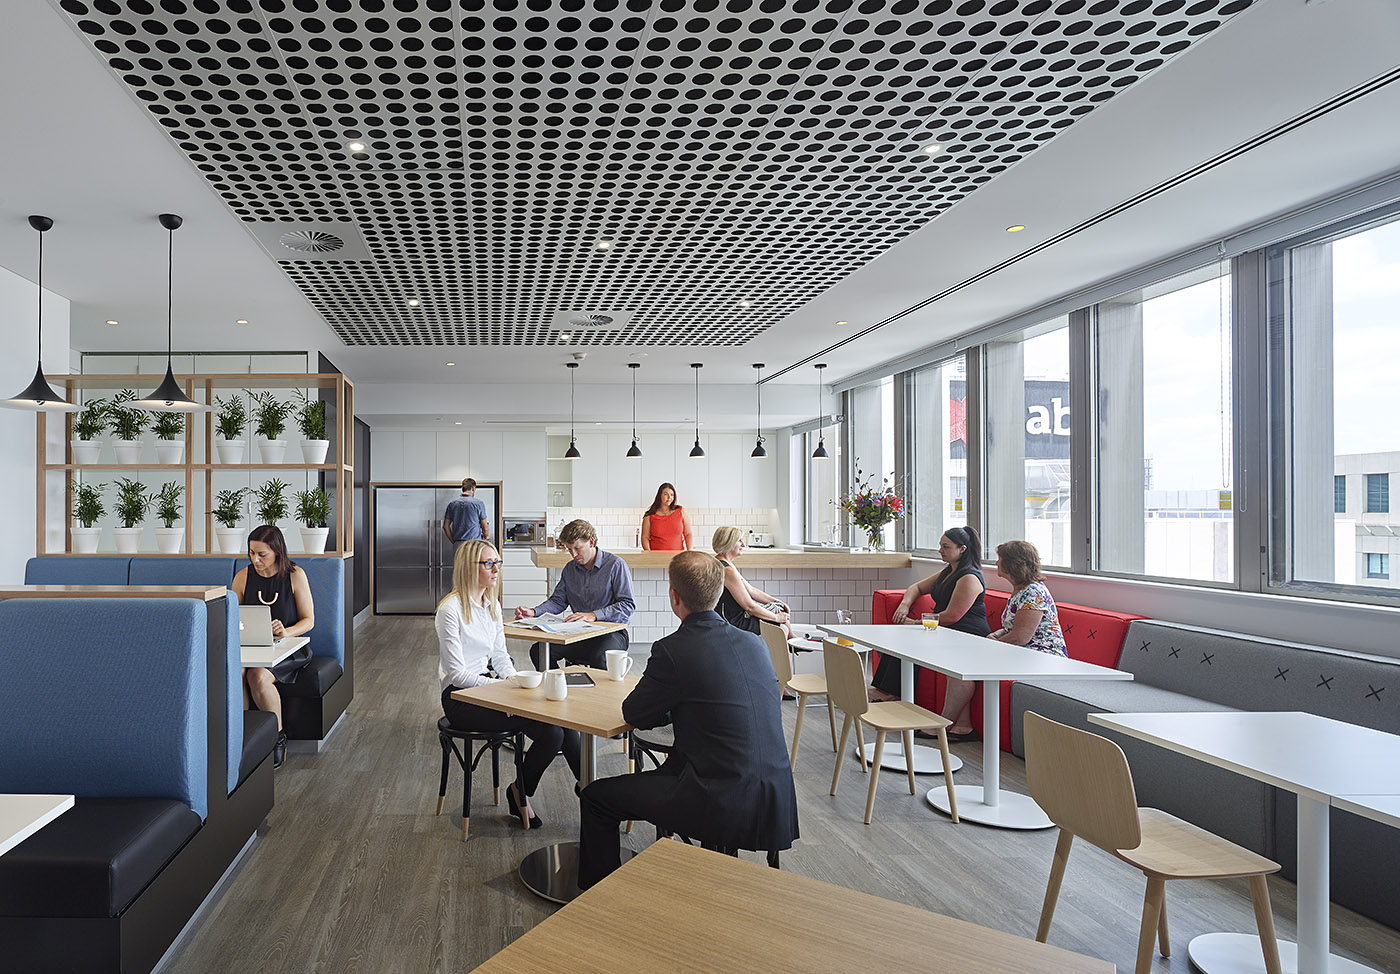 Ausure Brisbane Tenant Representation, Interior Design, Project & Construction Management Project Image 1 by PCG